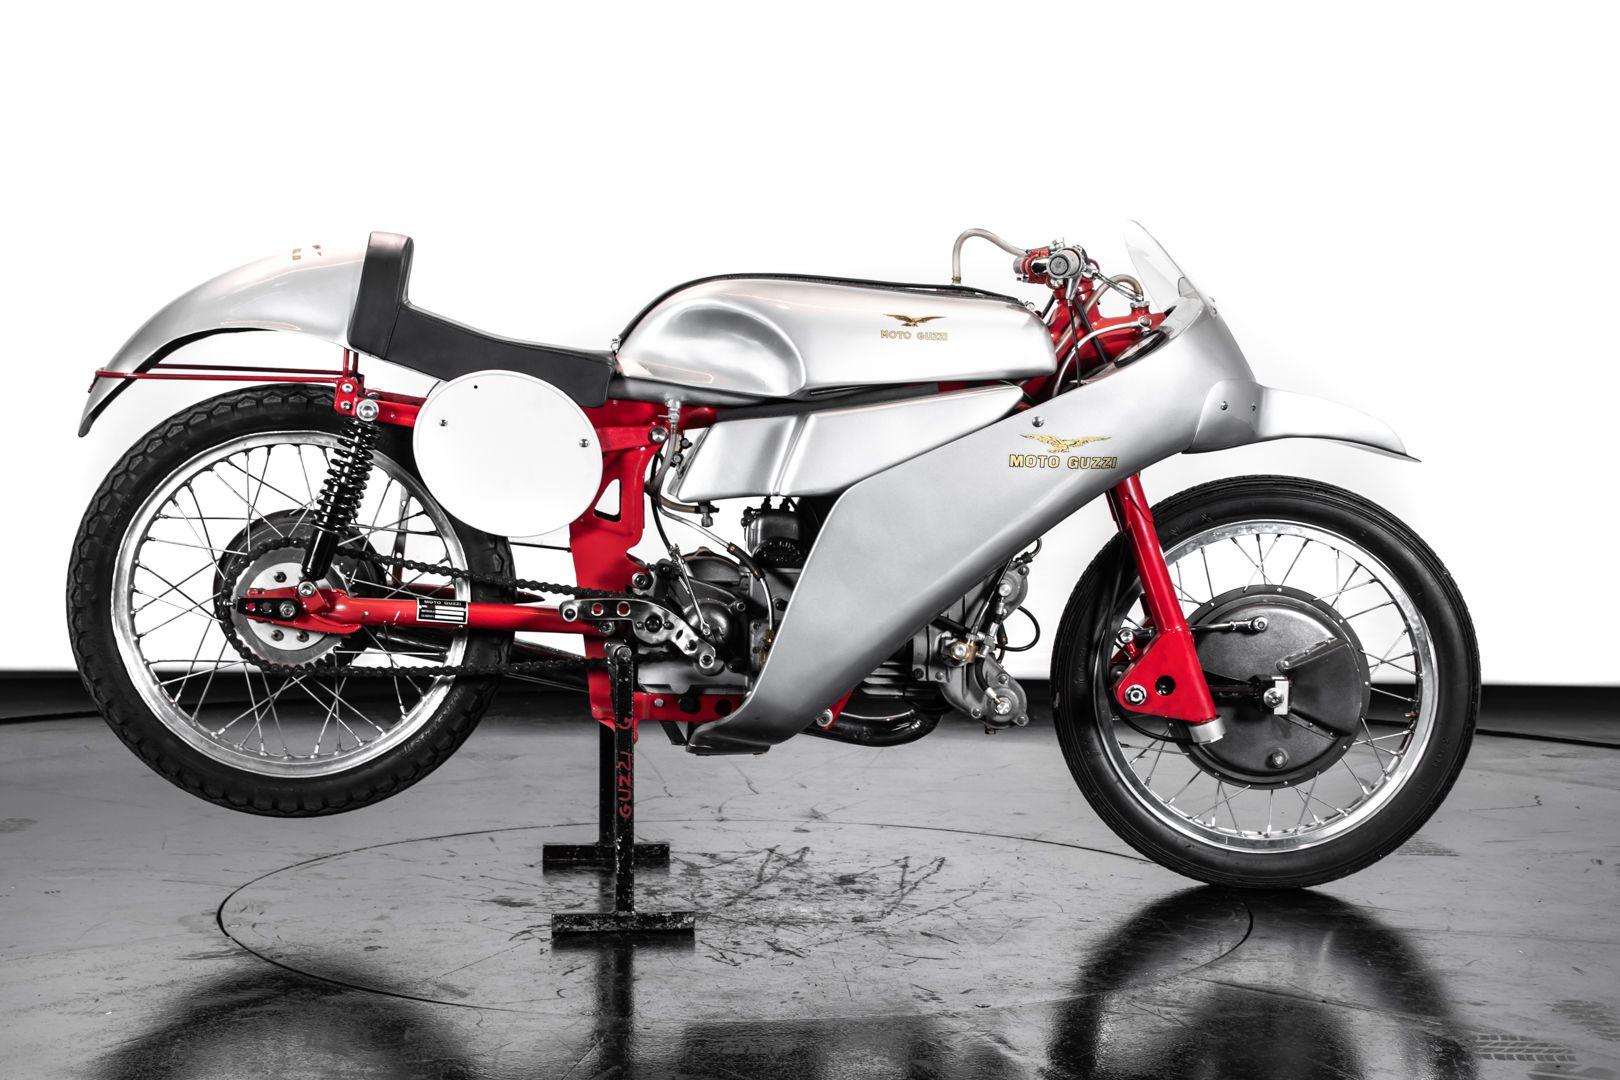 1930 Moto Guzzi 250 SS Corsa 77192